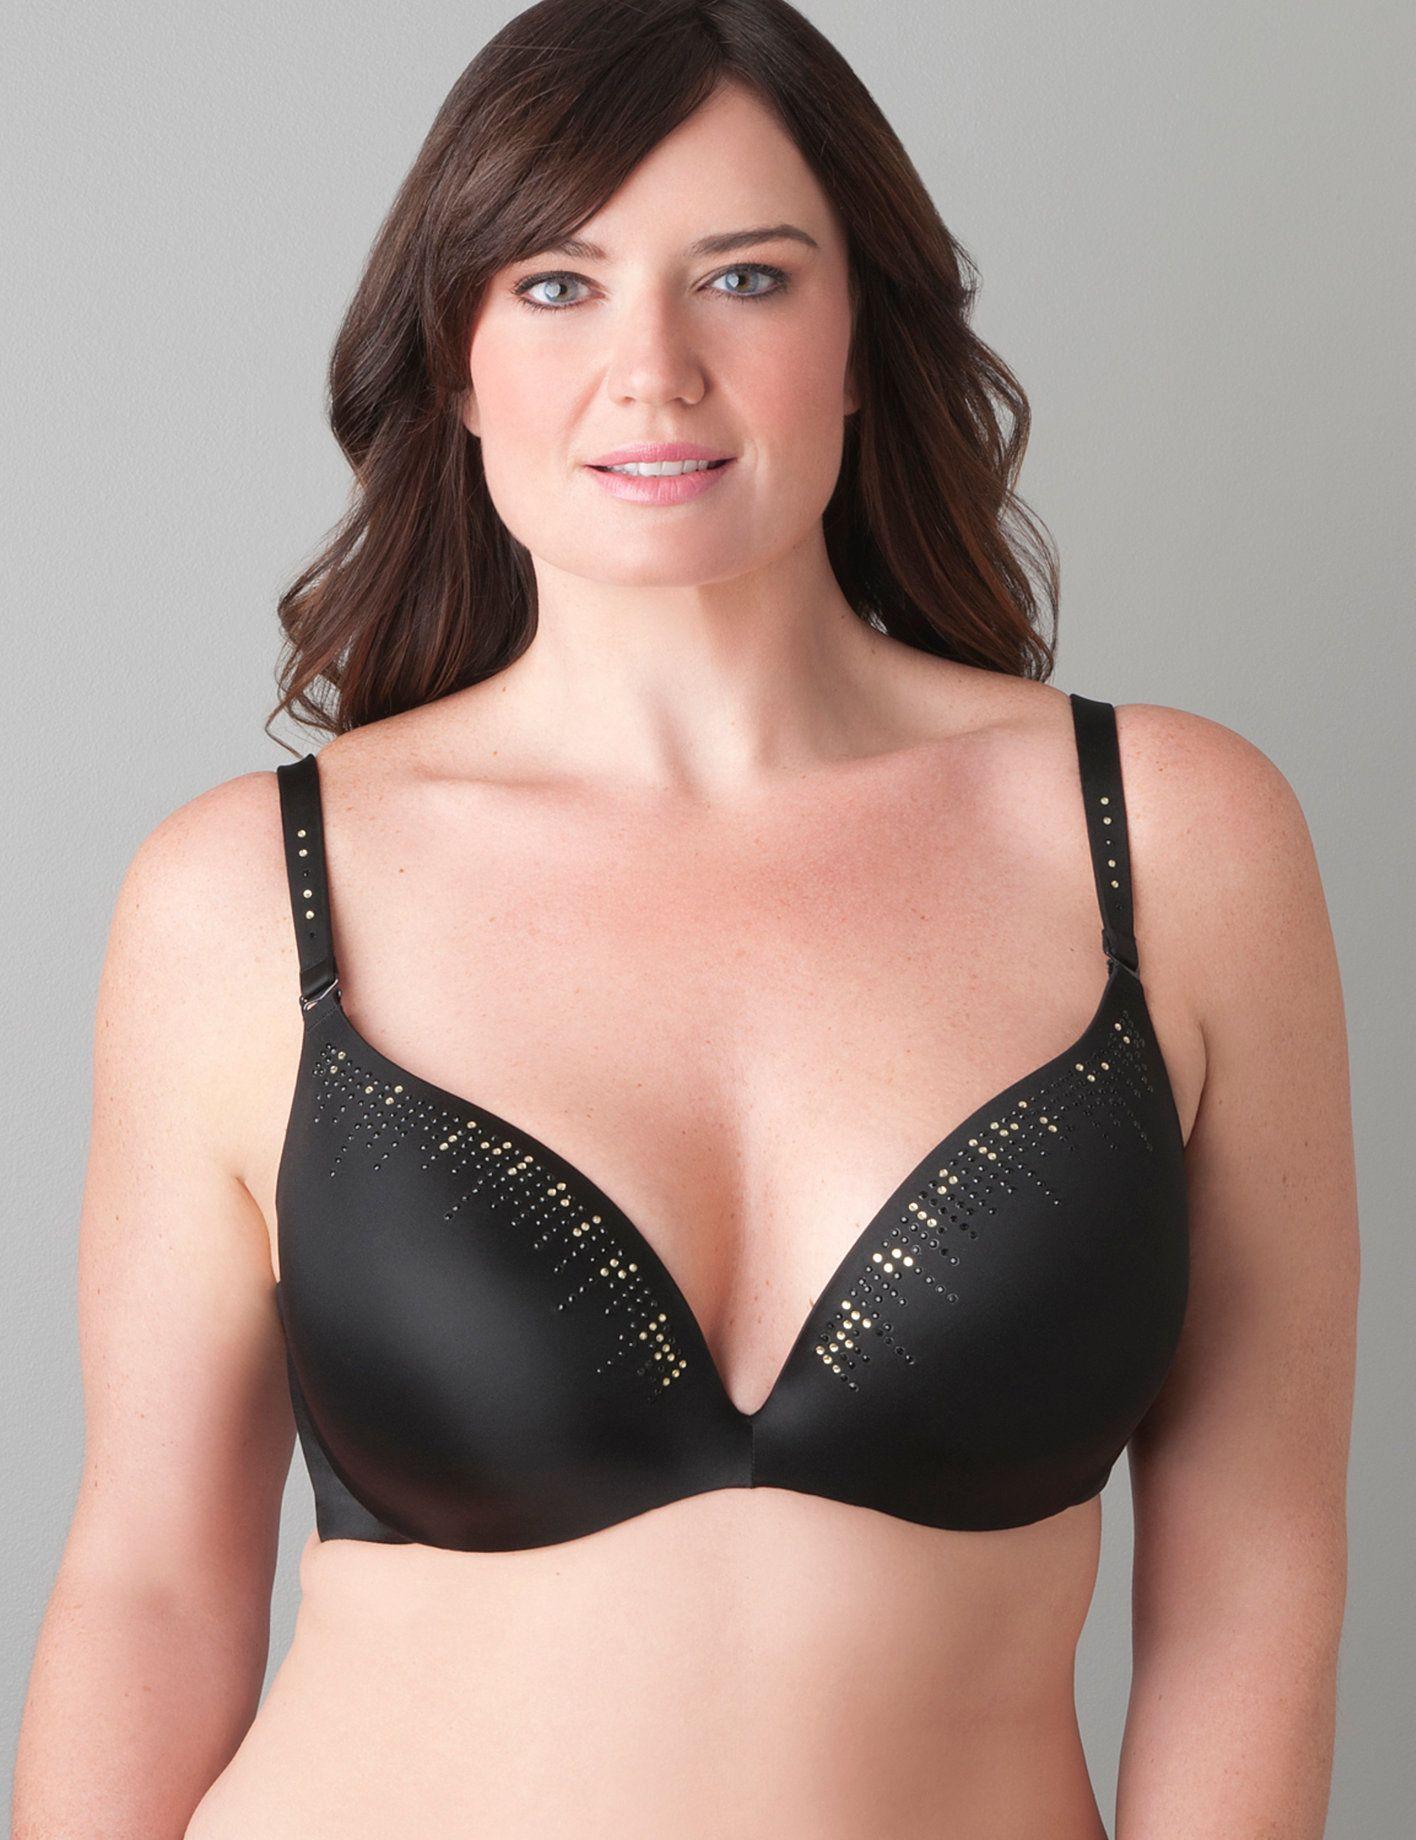 plus size bras | full figure bras, ddd bras & above | lane bryant